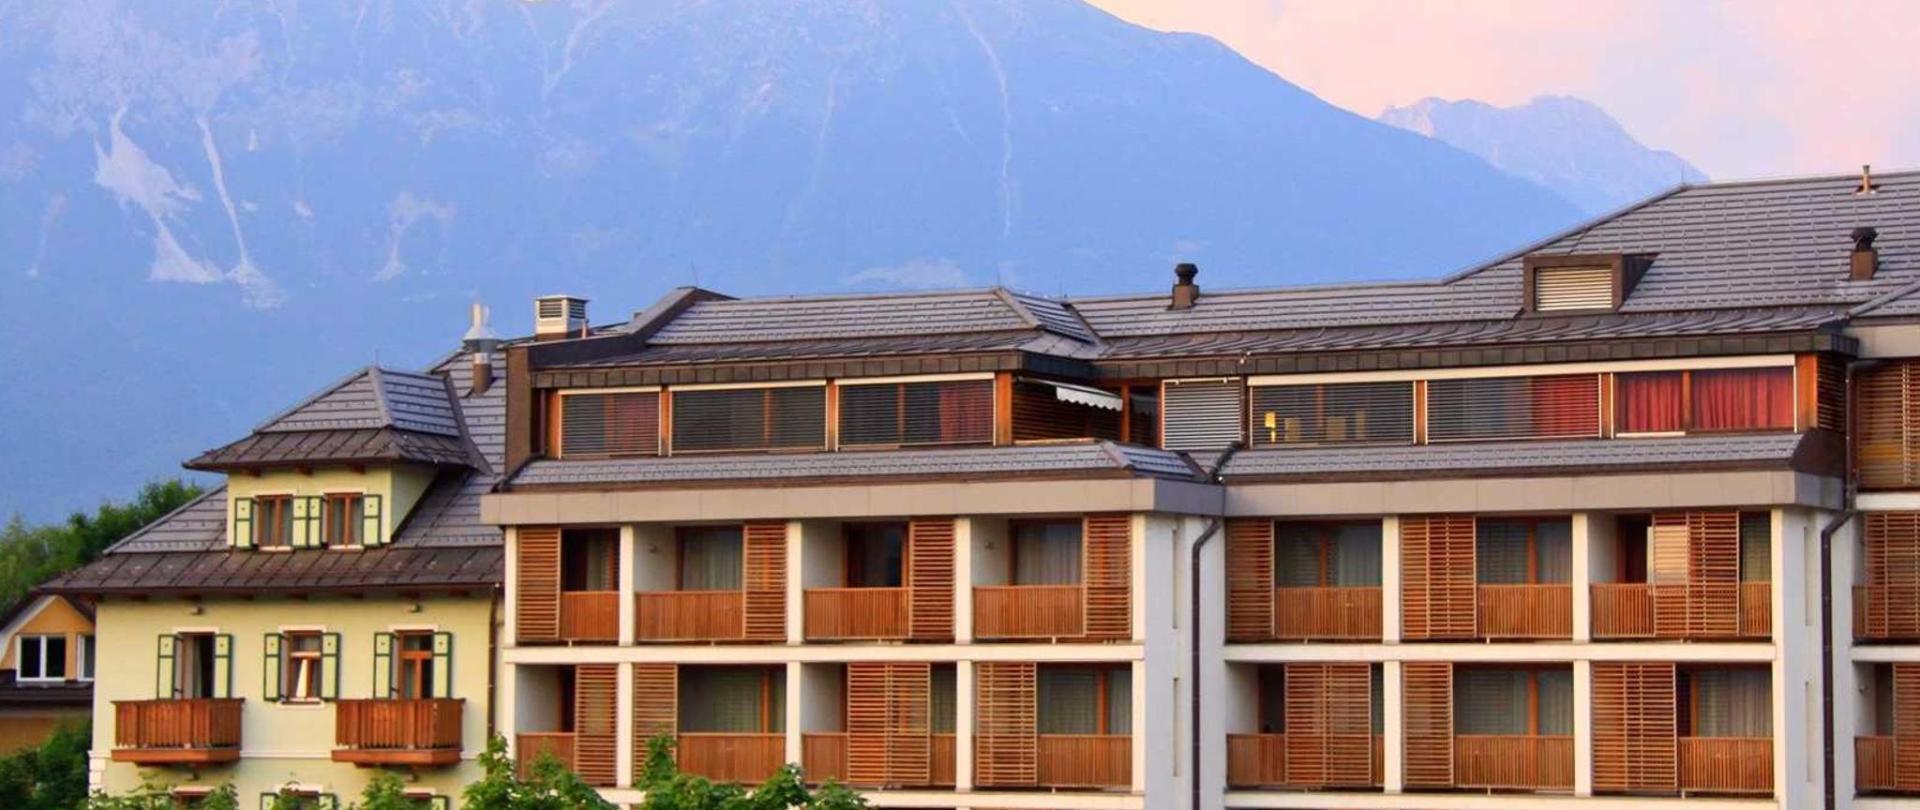 Best Western Premier Hotel Lovec - Exterior